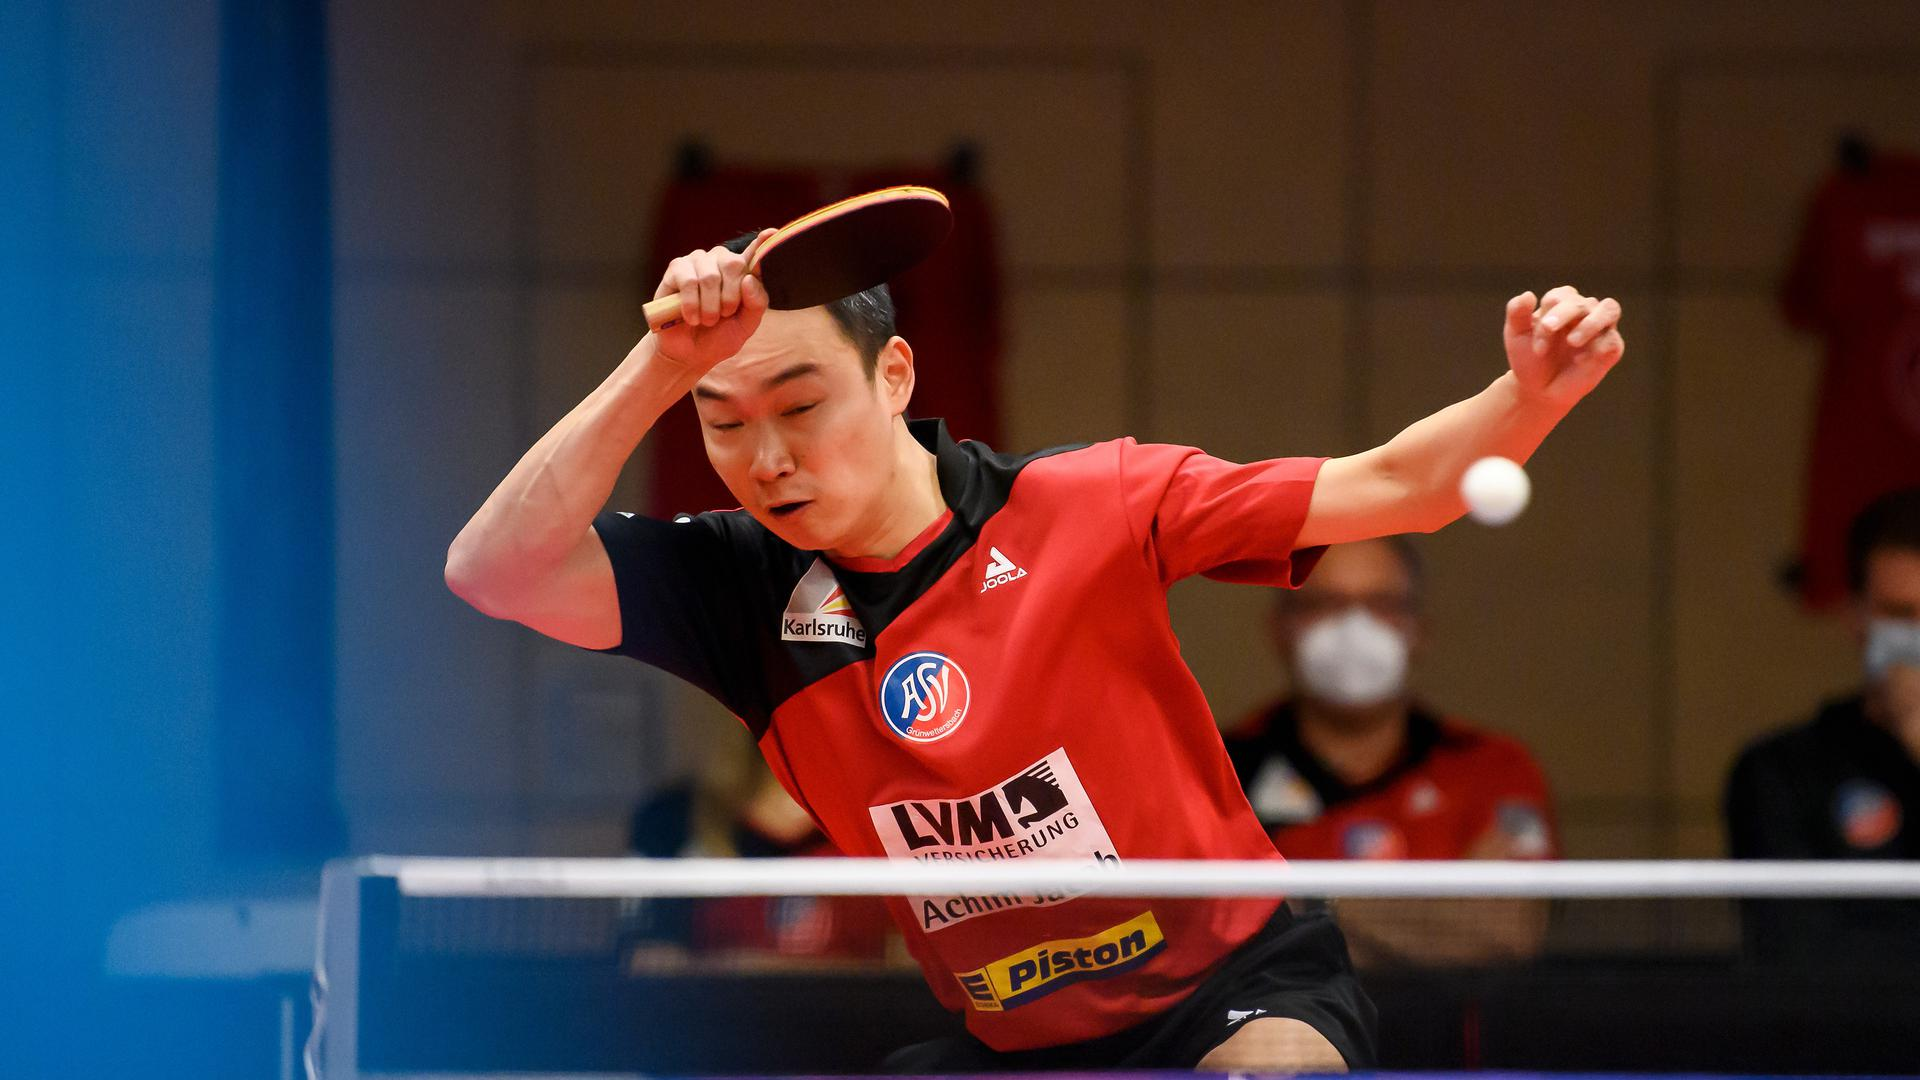 Xi Wang (Gruenwettersbach)   GES/ Tischtennis/ 1. Bundesliga Final Four Halbfinale Hinspiel: ASV Gruenwettersbach - Borussia Duesseldorf, 28.03.2021 --